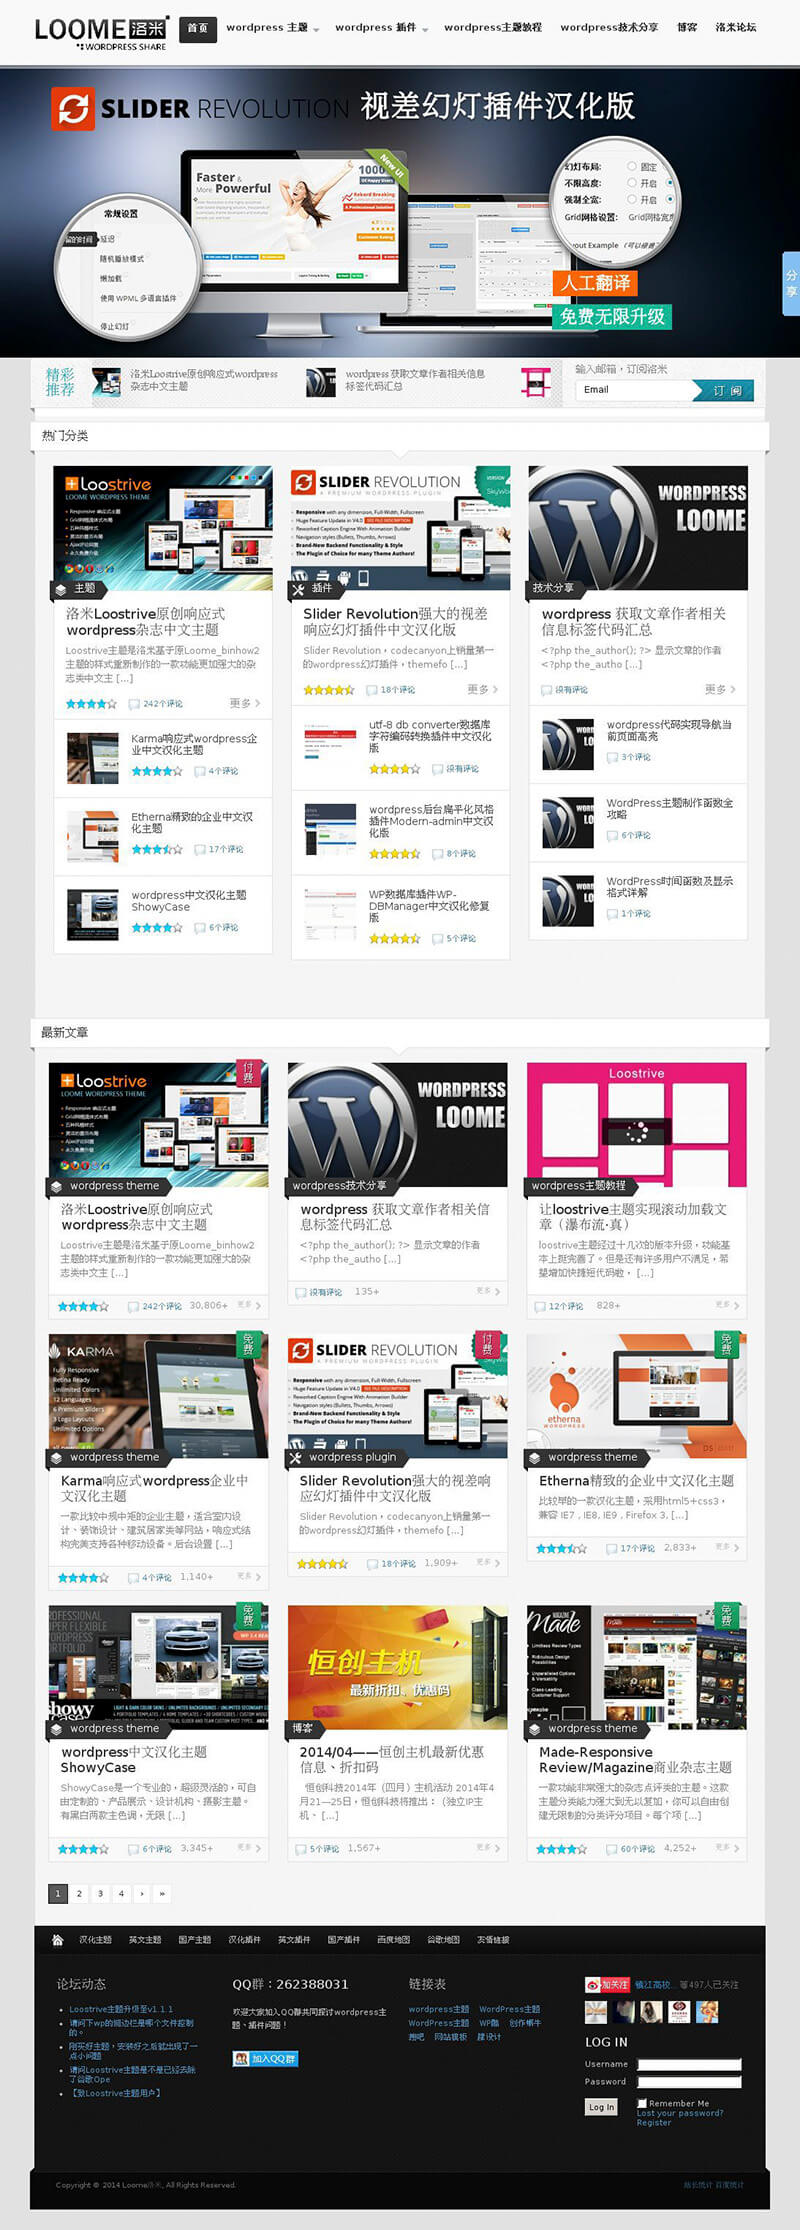 WordPress汉化主题:Made-Magazine主题汉化修改版